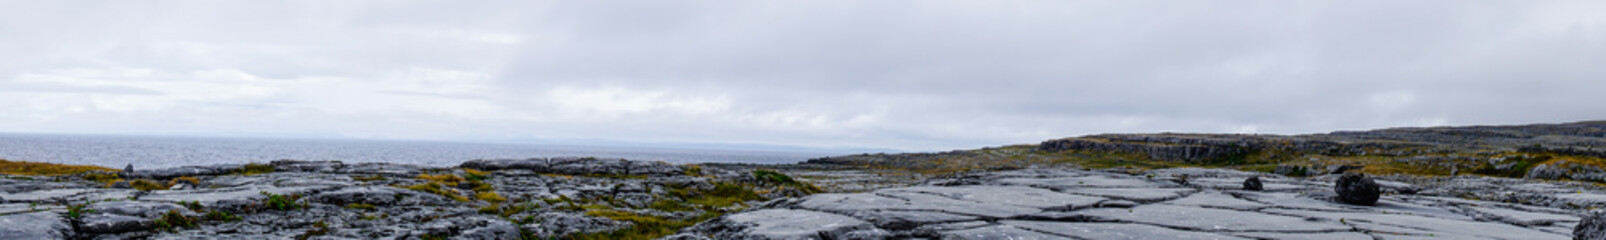 Panorama Landscape Burren Ireland